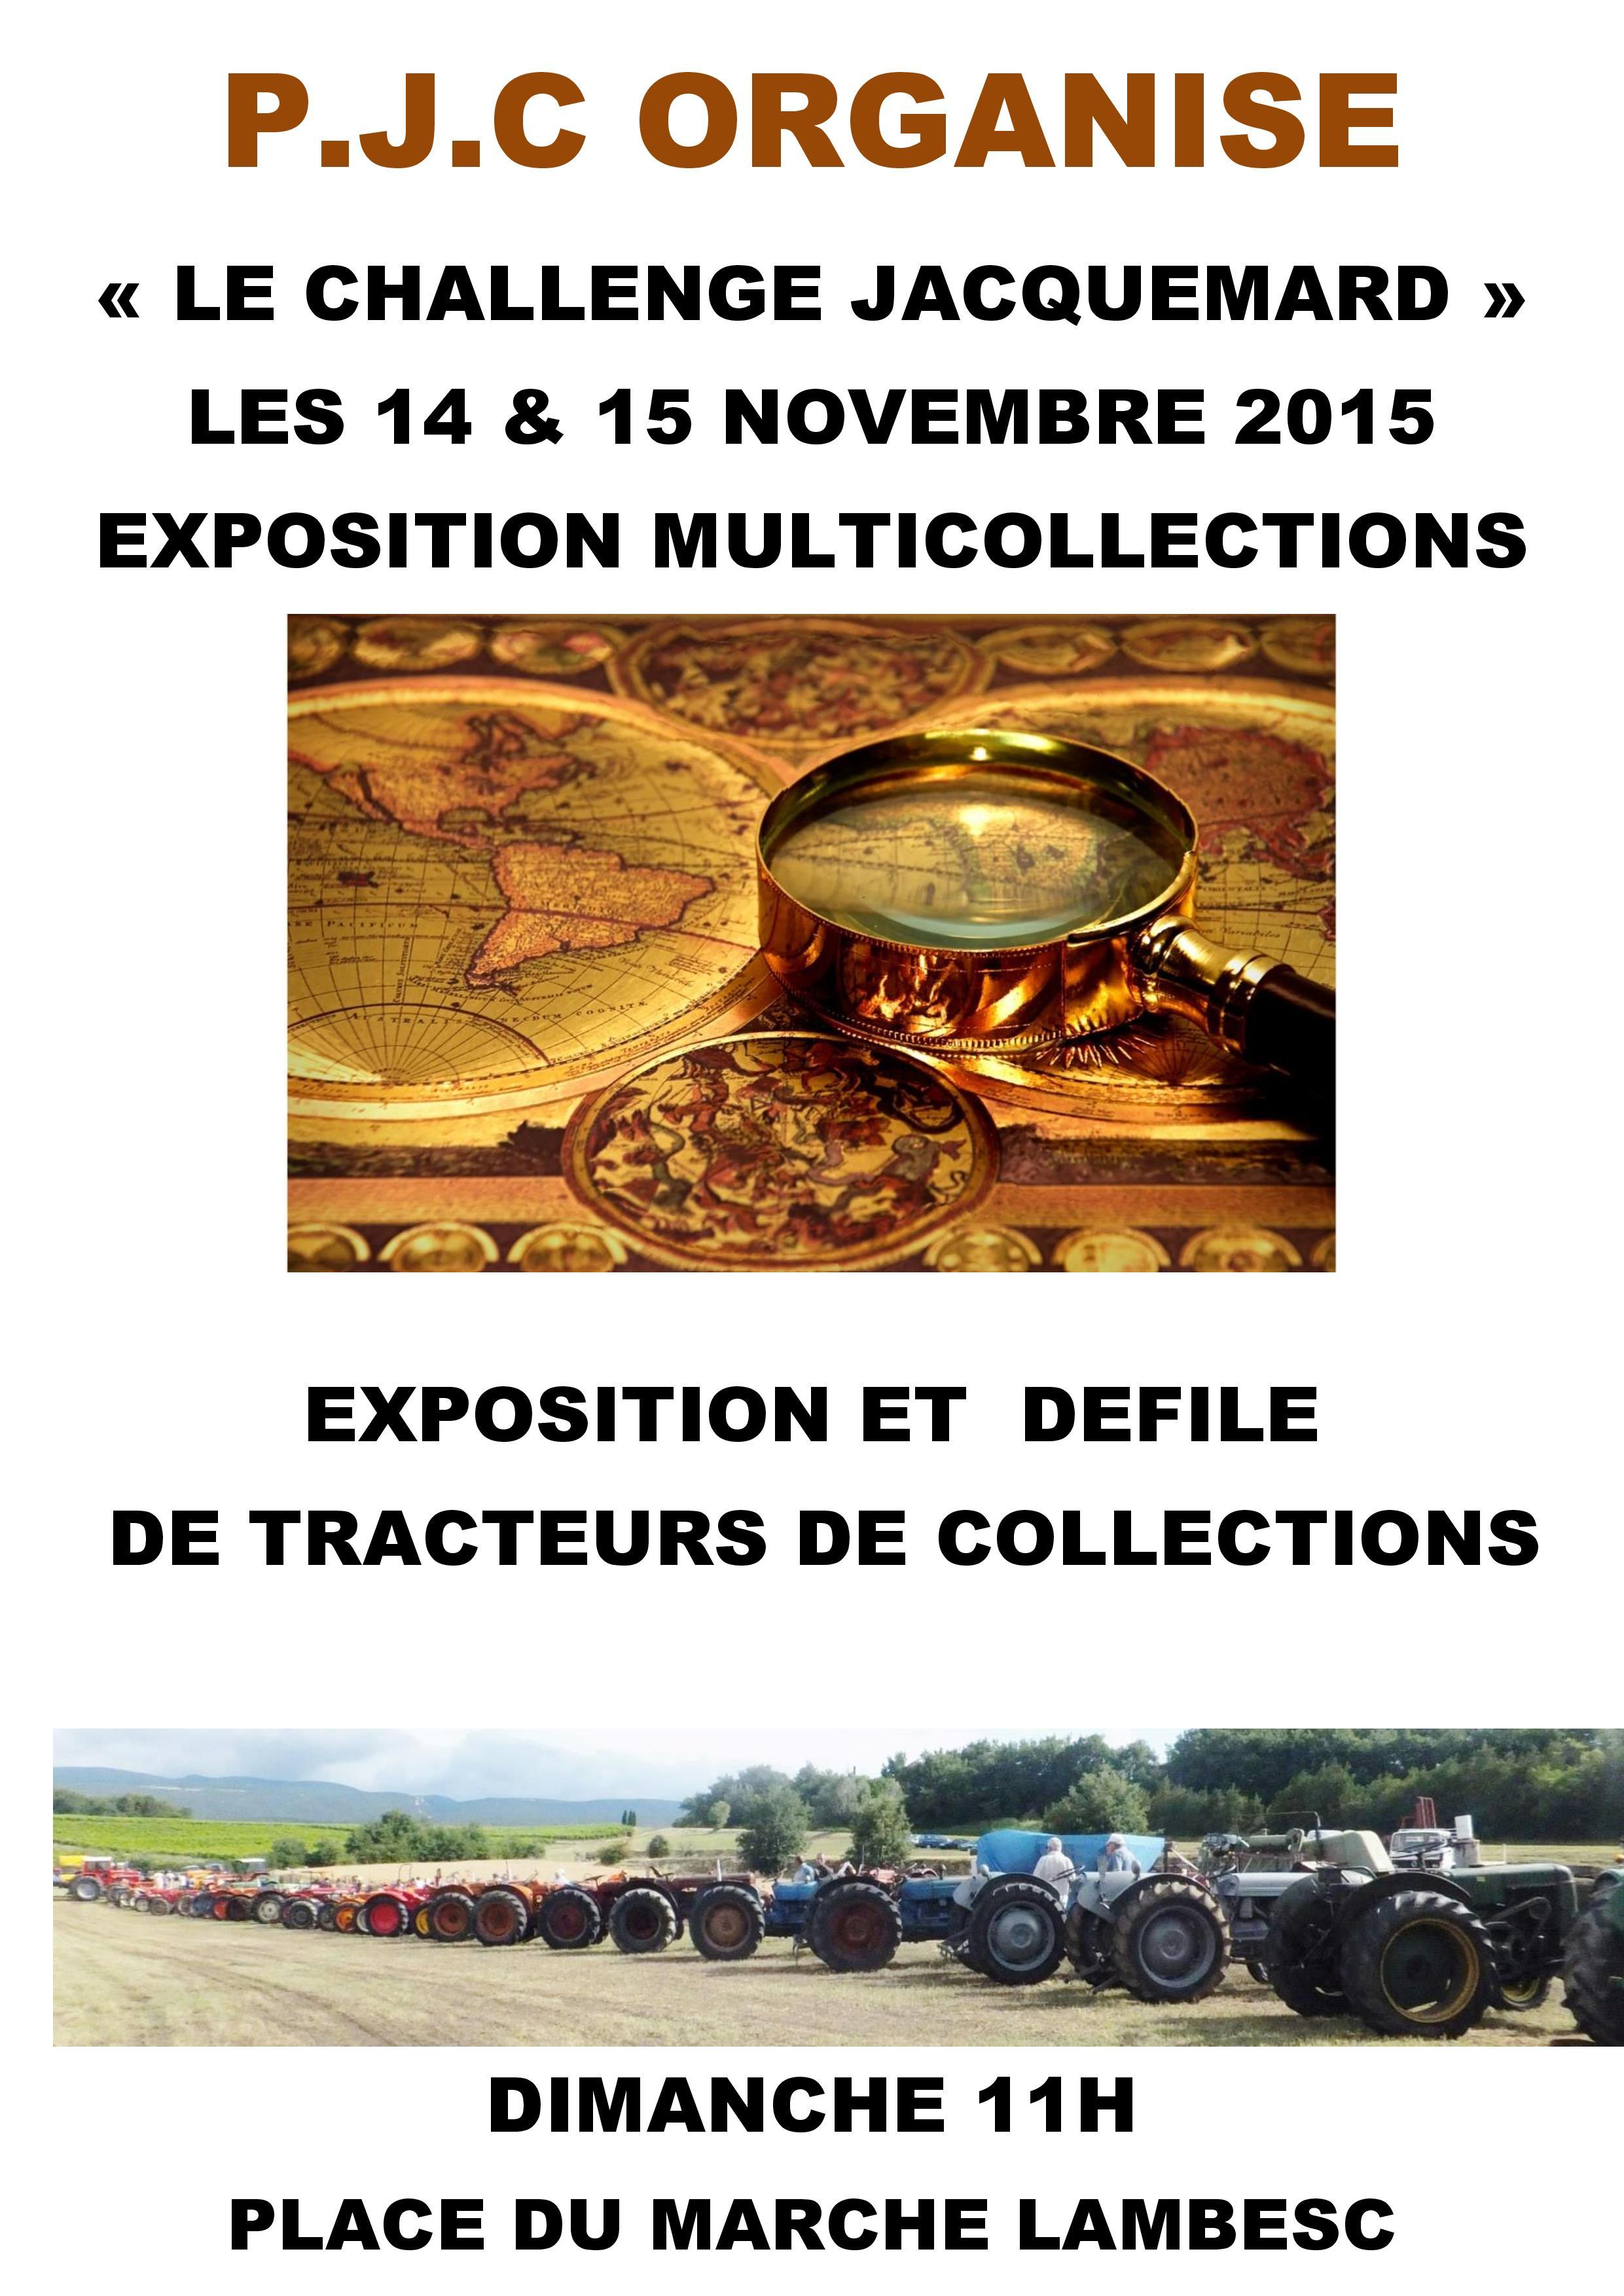 Challenge Jacquemard